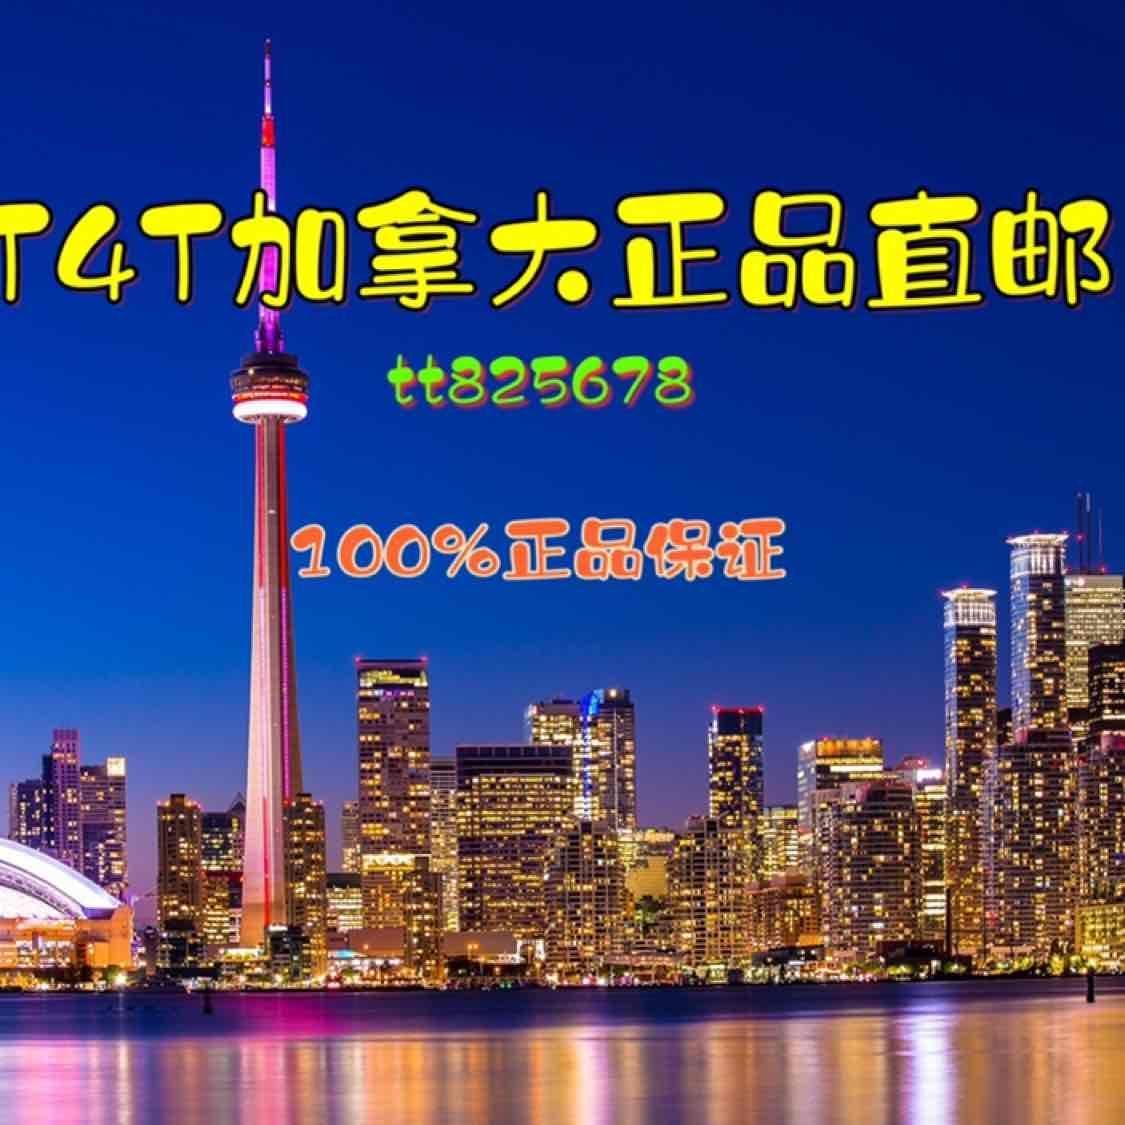 T4T加拿大正品直邮